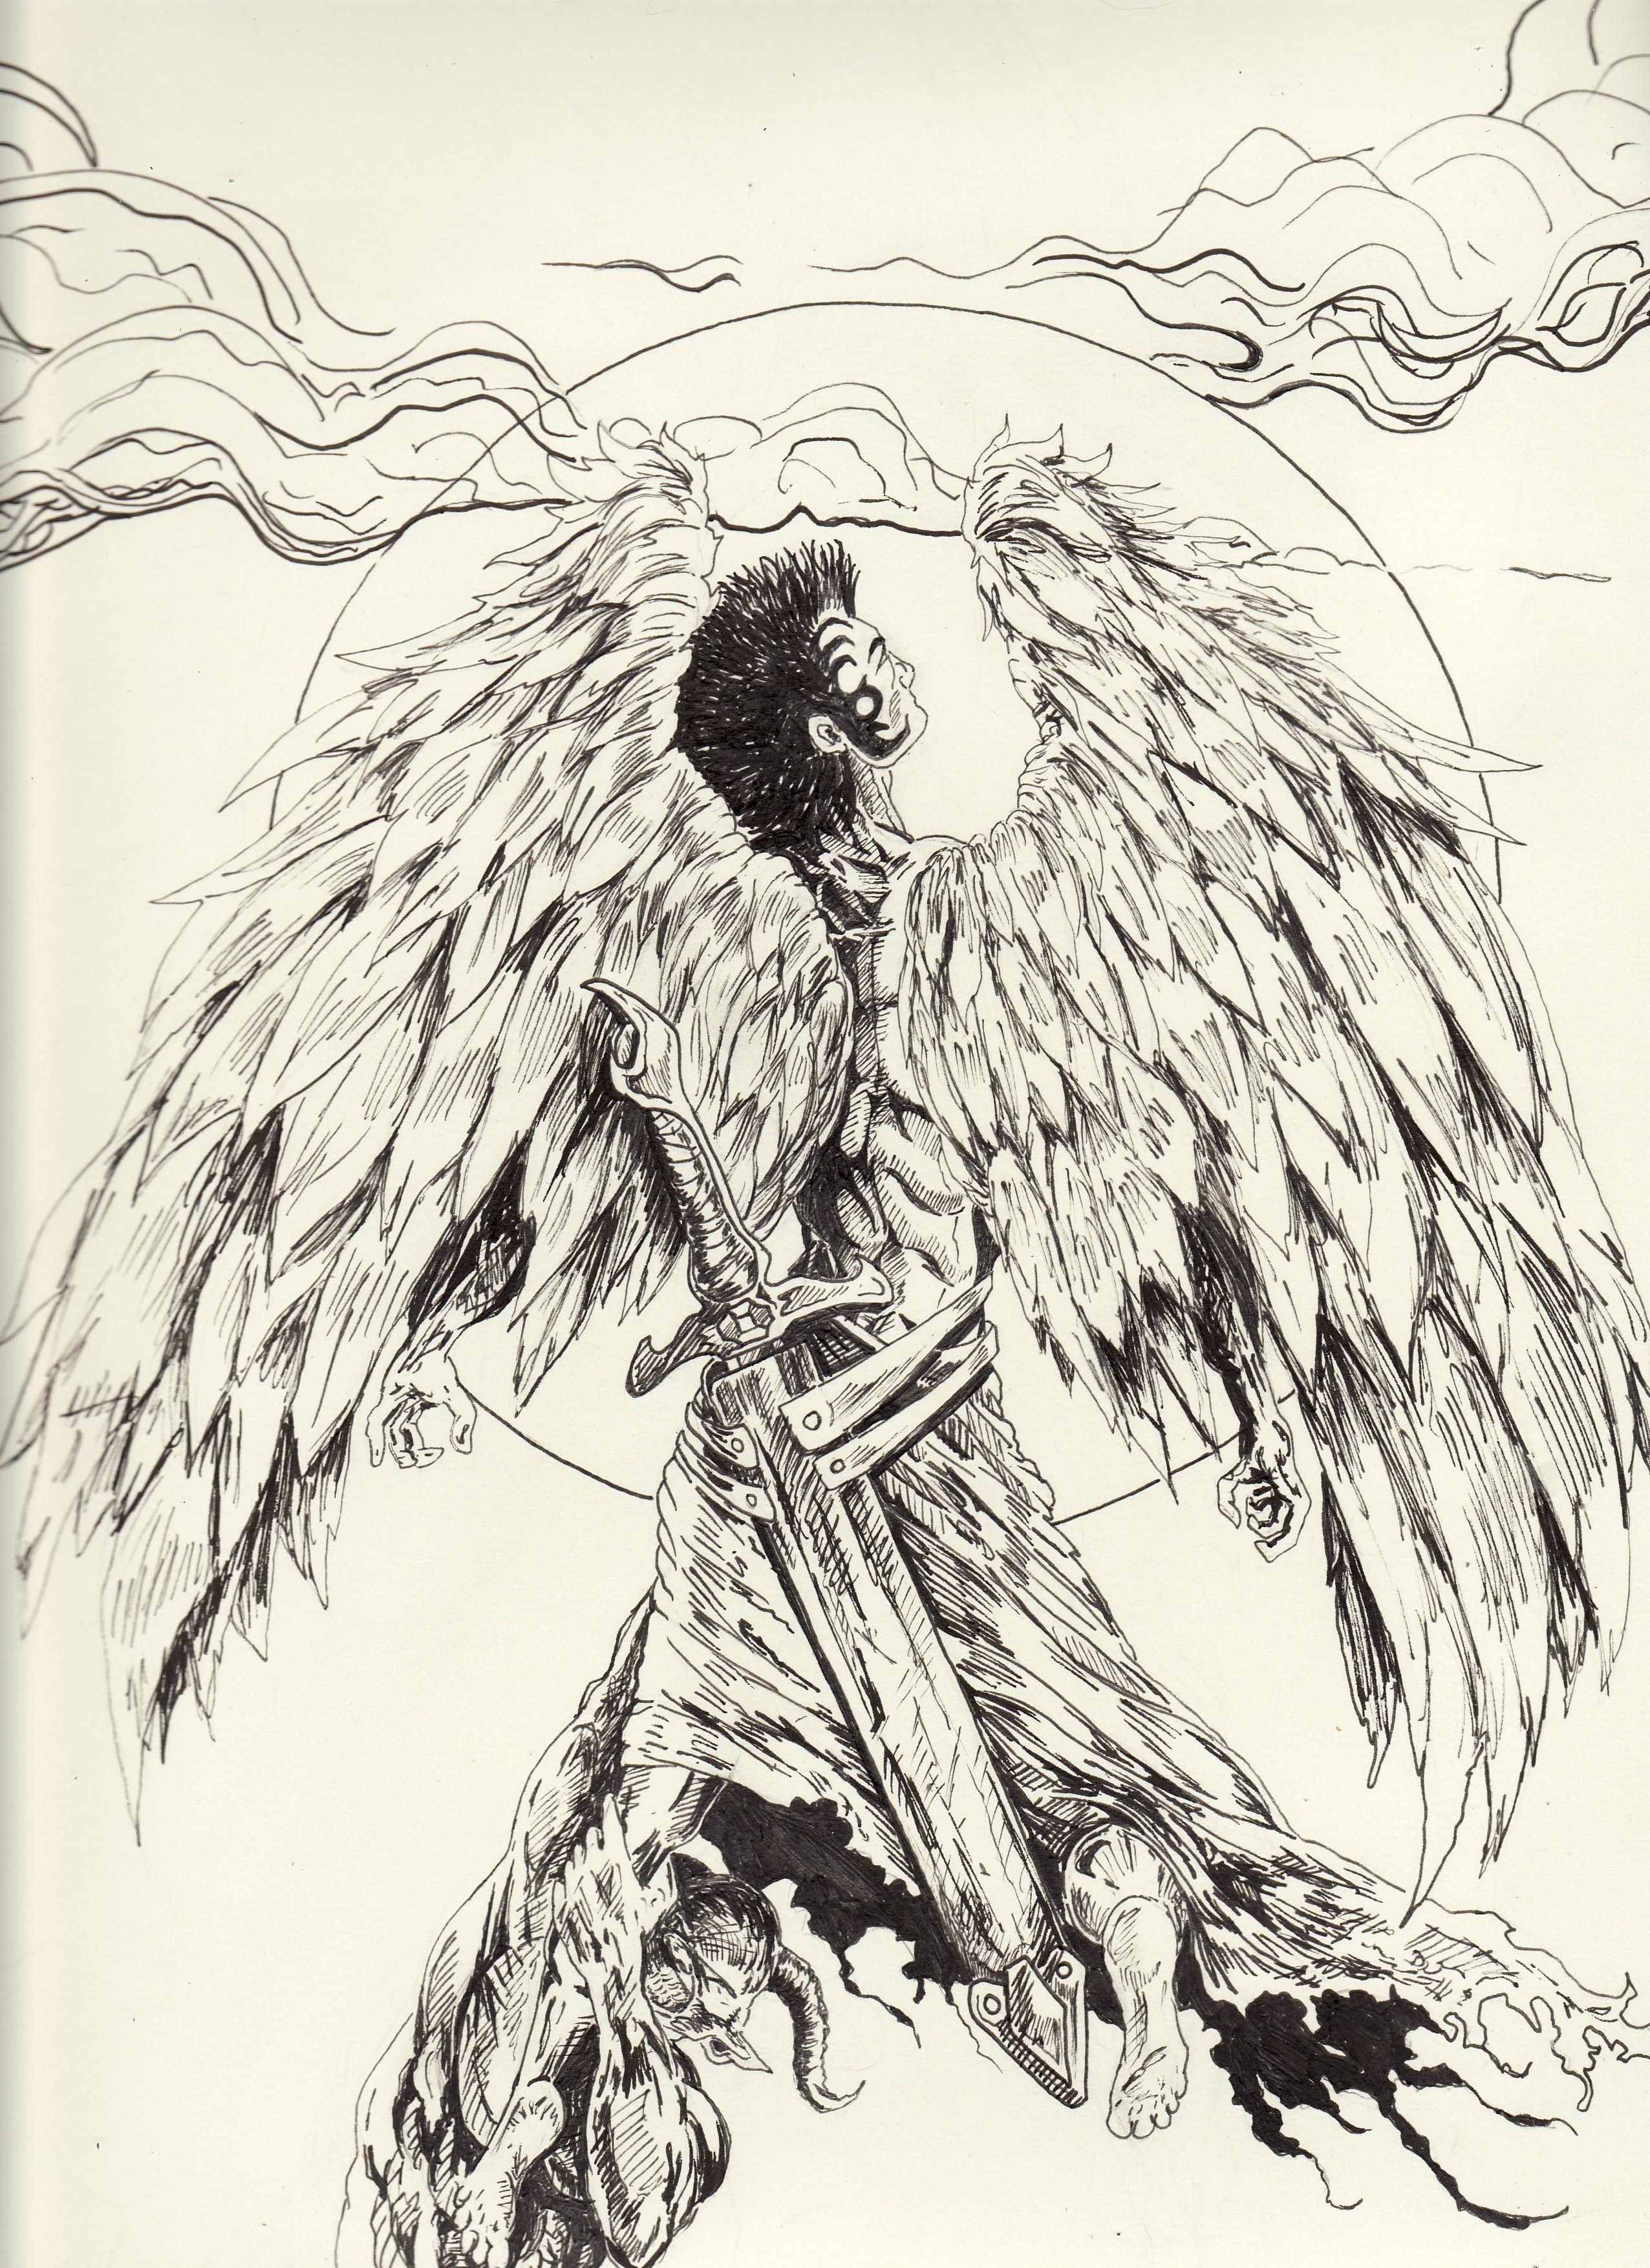 angel and demons drawings - photo #17